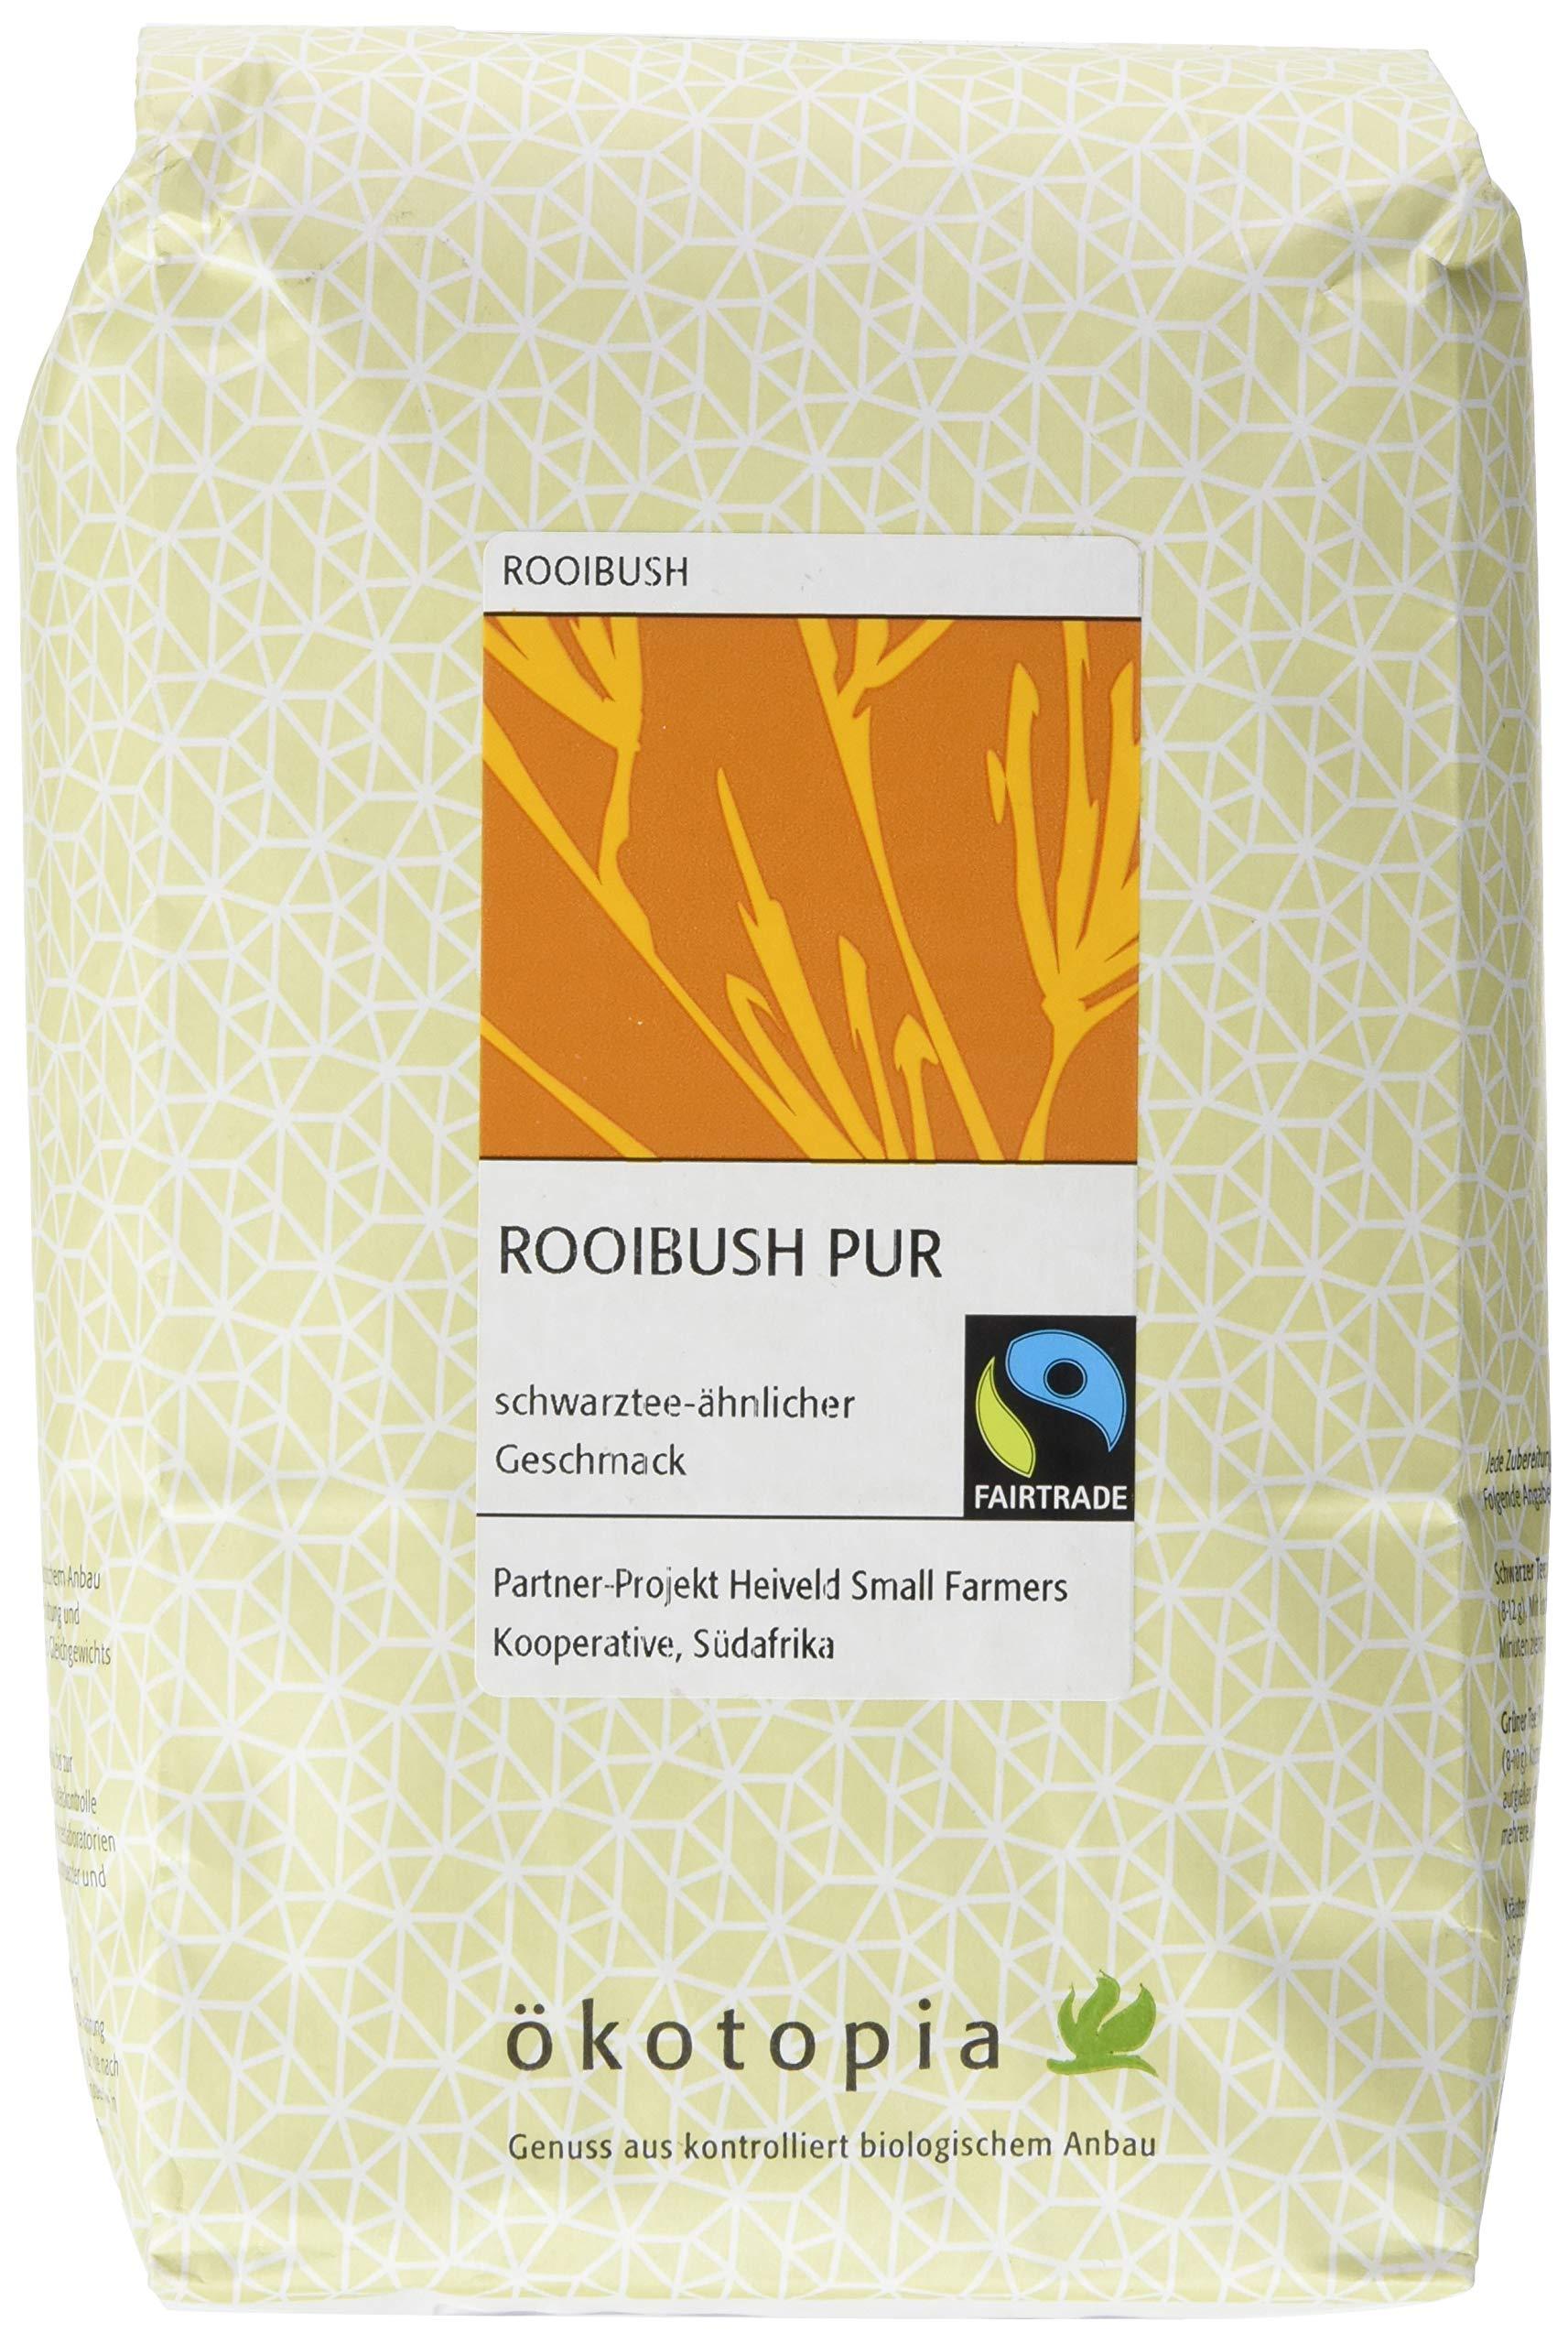 kotopia-Rooibush-pur-1er-Pack-1-x-500-g